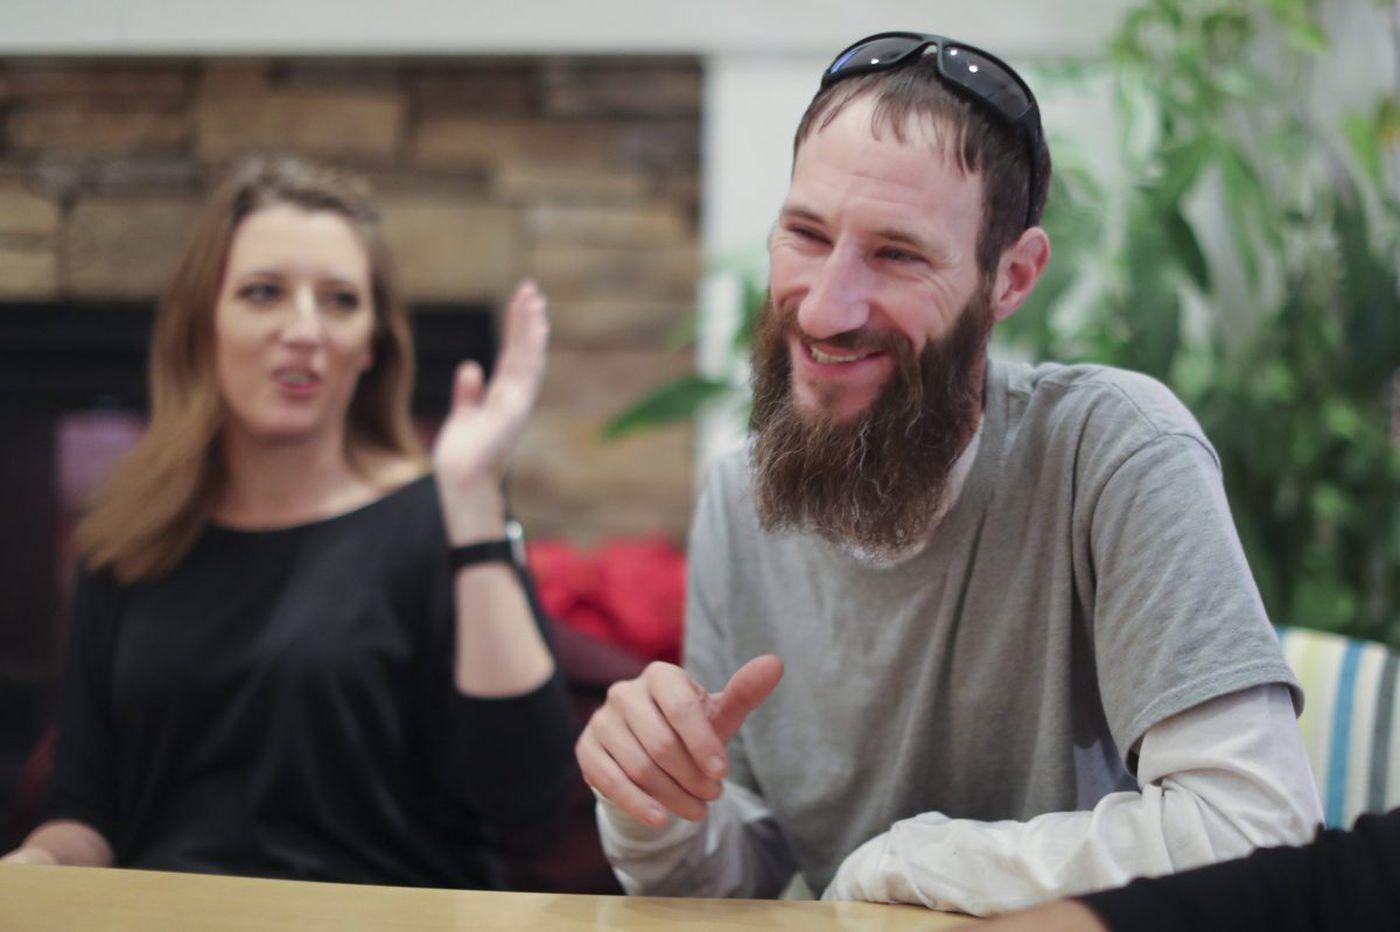 How a $400K viral windfall transformed life of homeless Good Samaritan Johnny Bobbitt